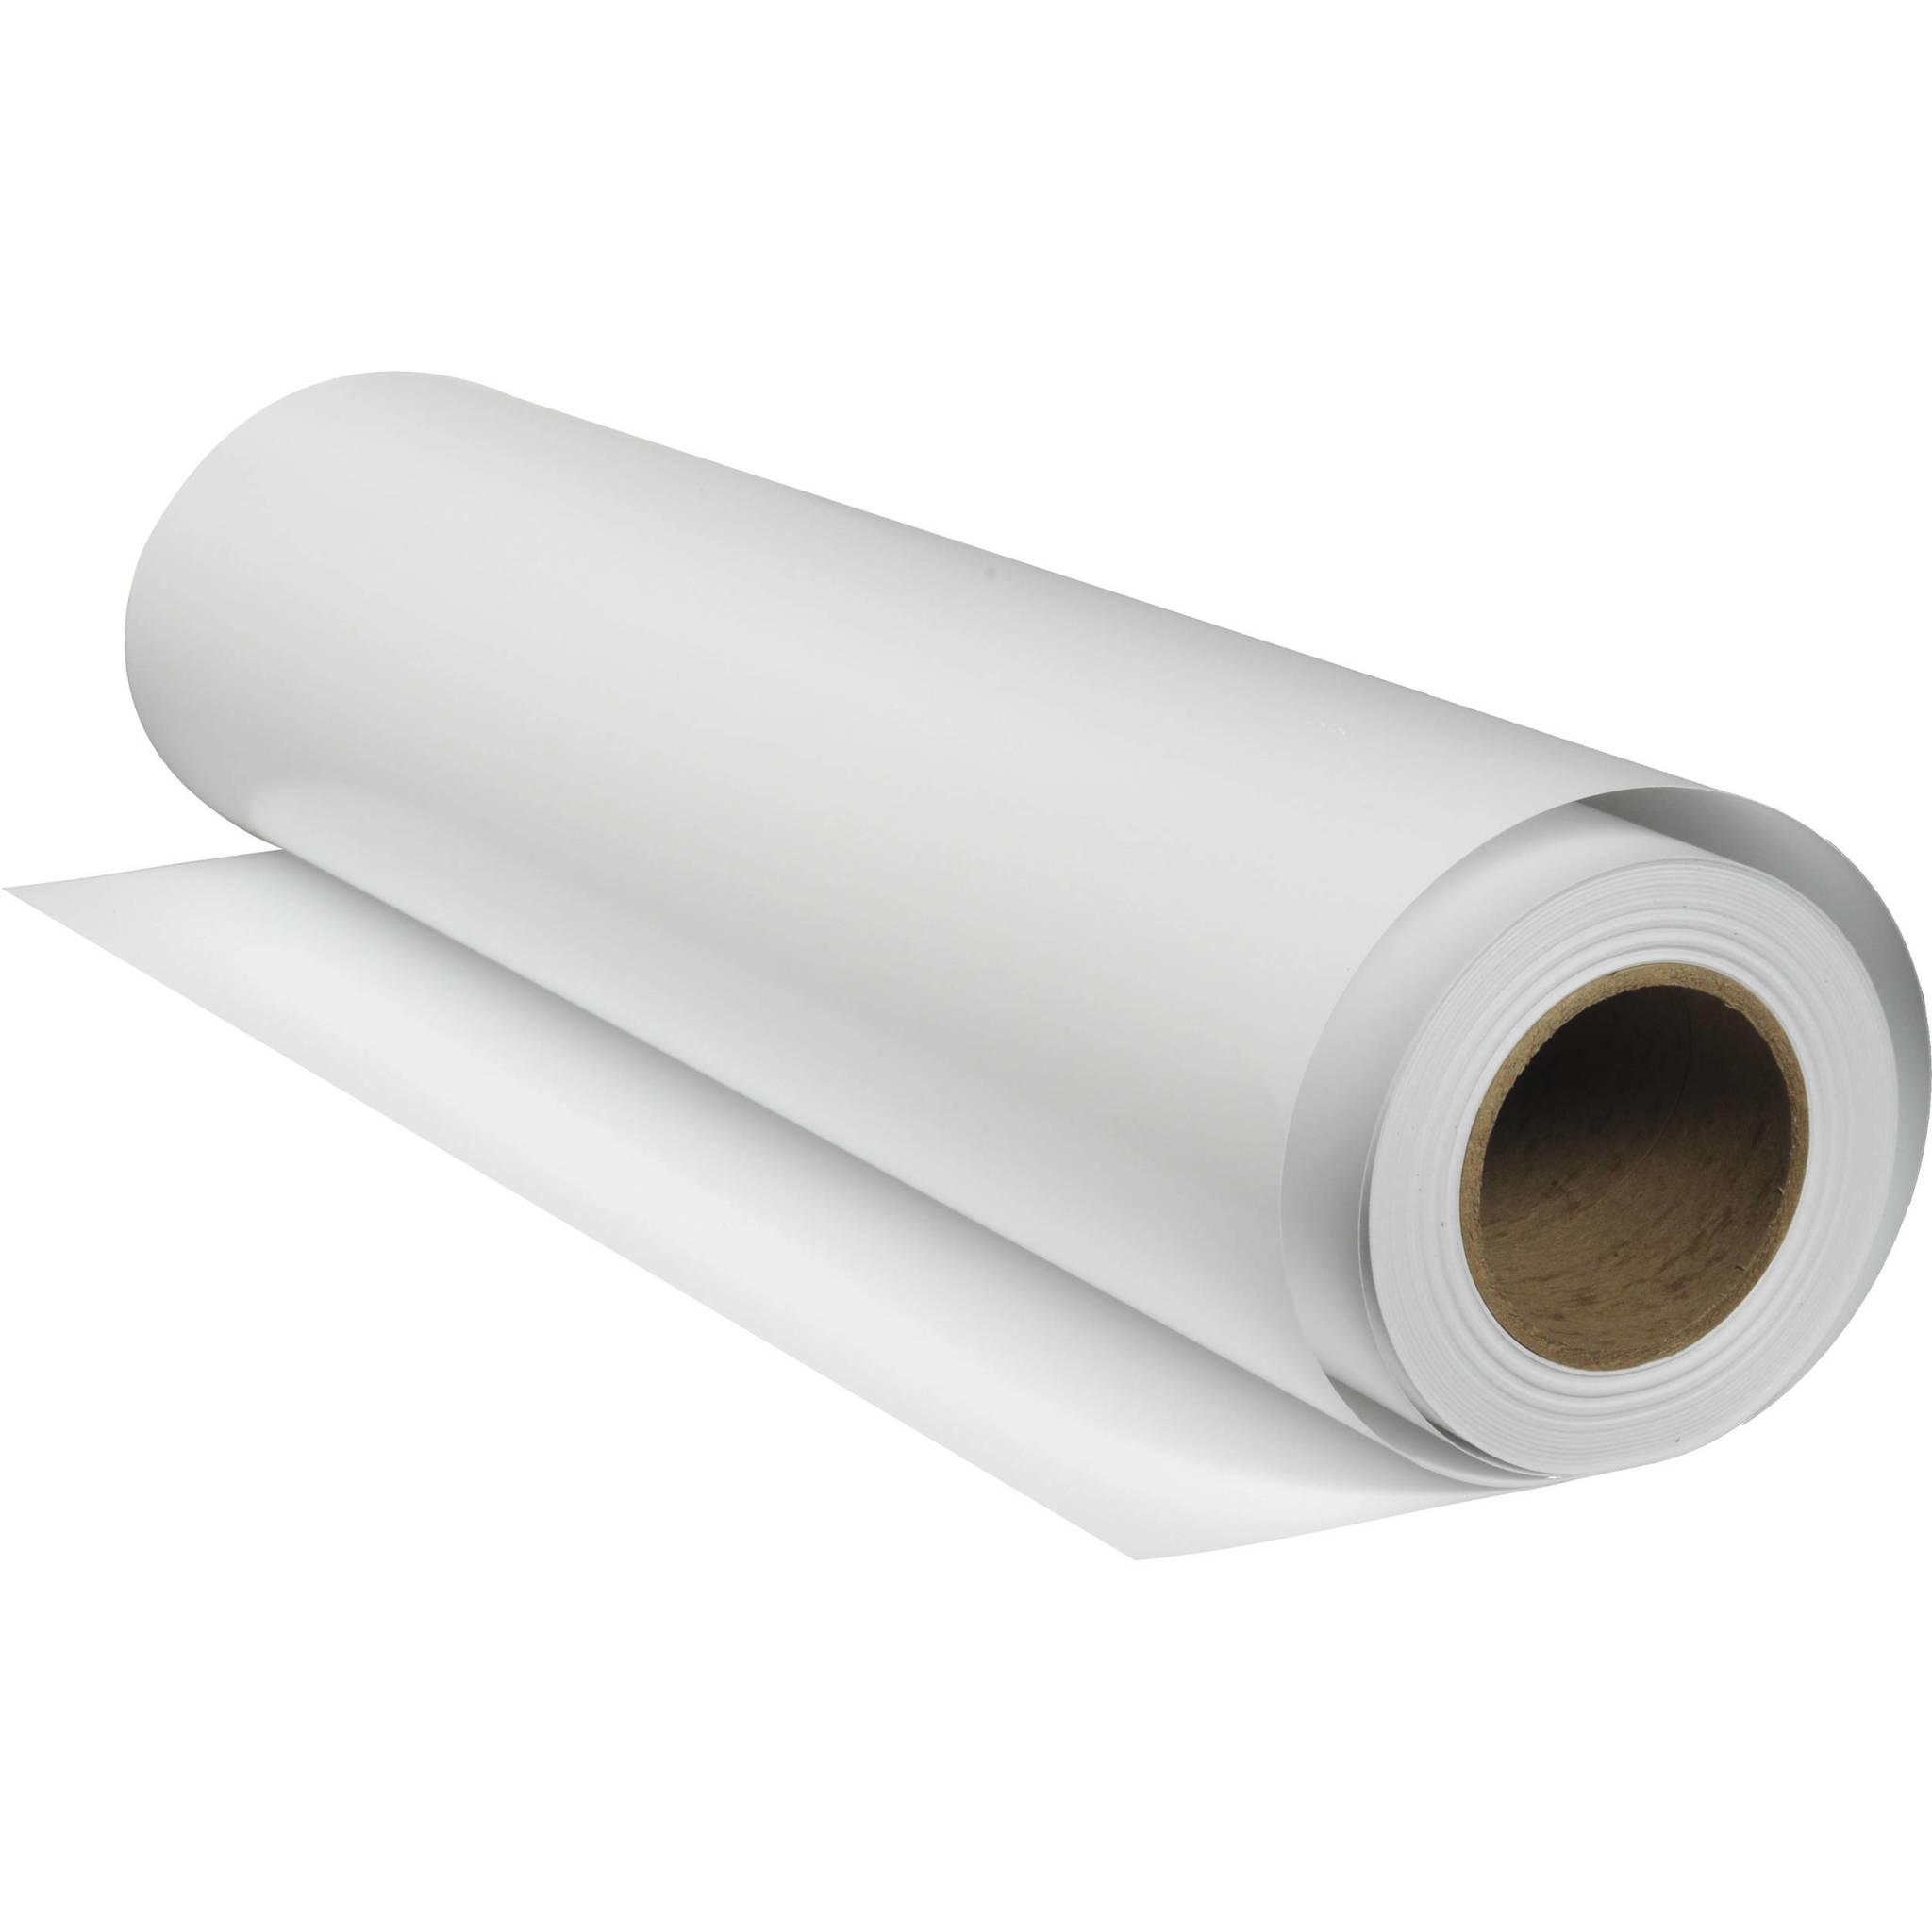 Epson Premium Luster 260 44in Roll per running inch-1